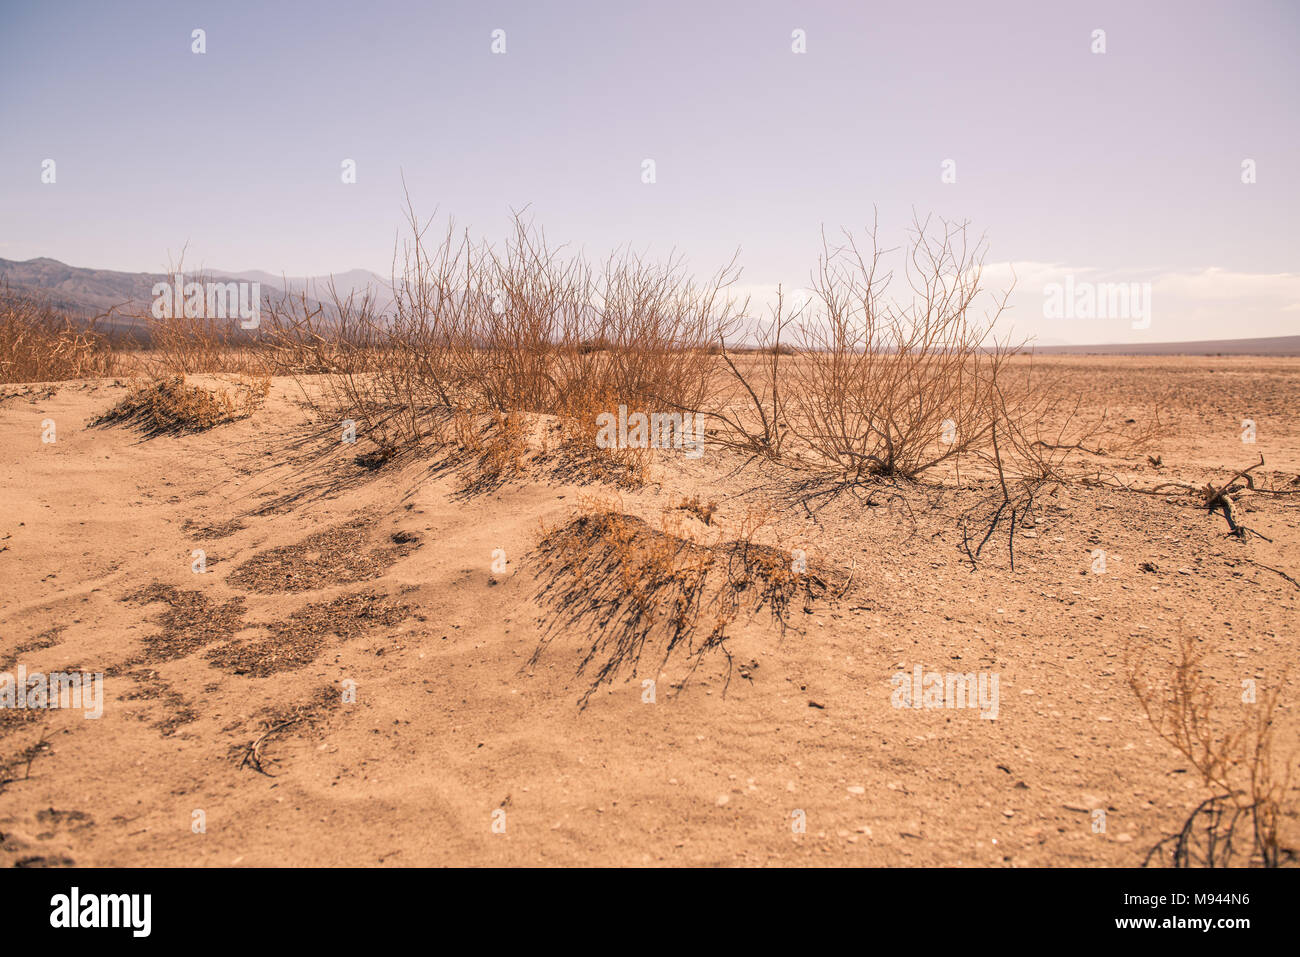 The desert of Death Valley Arizona - Stock Image